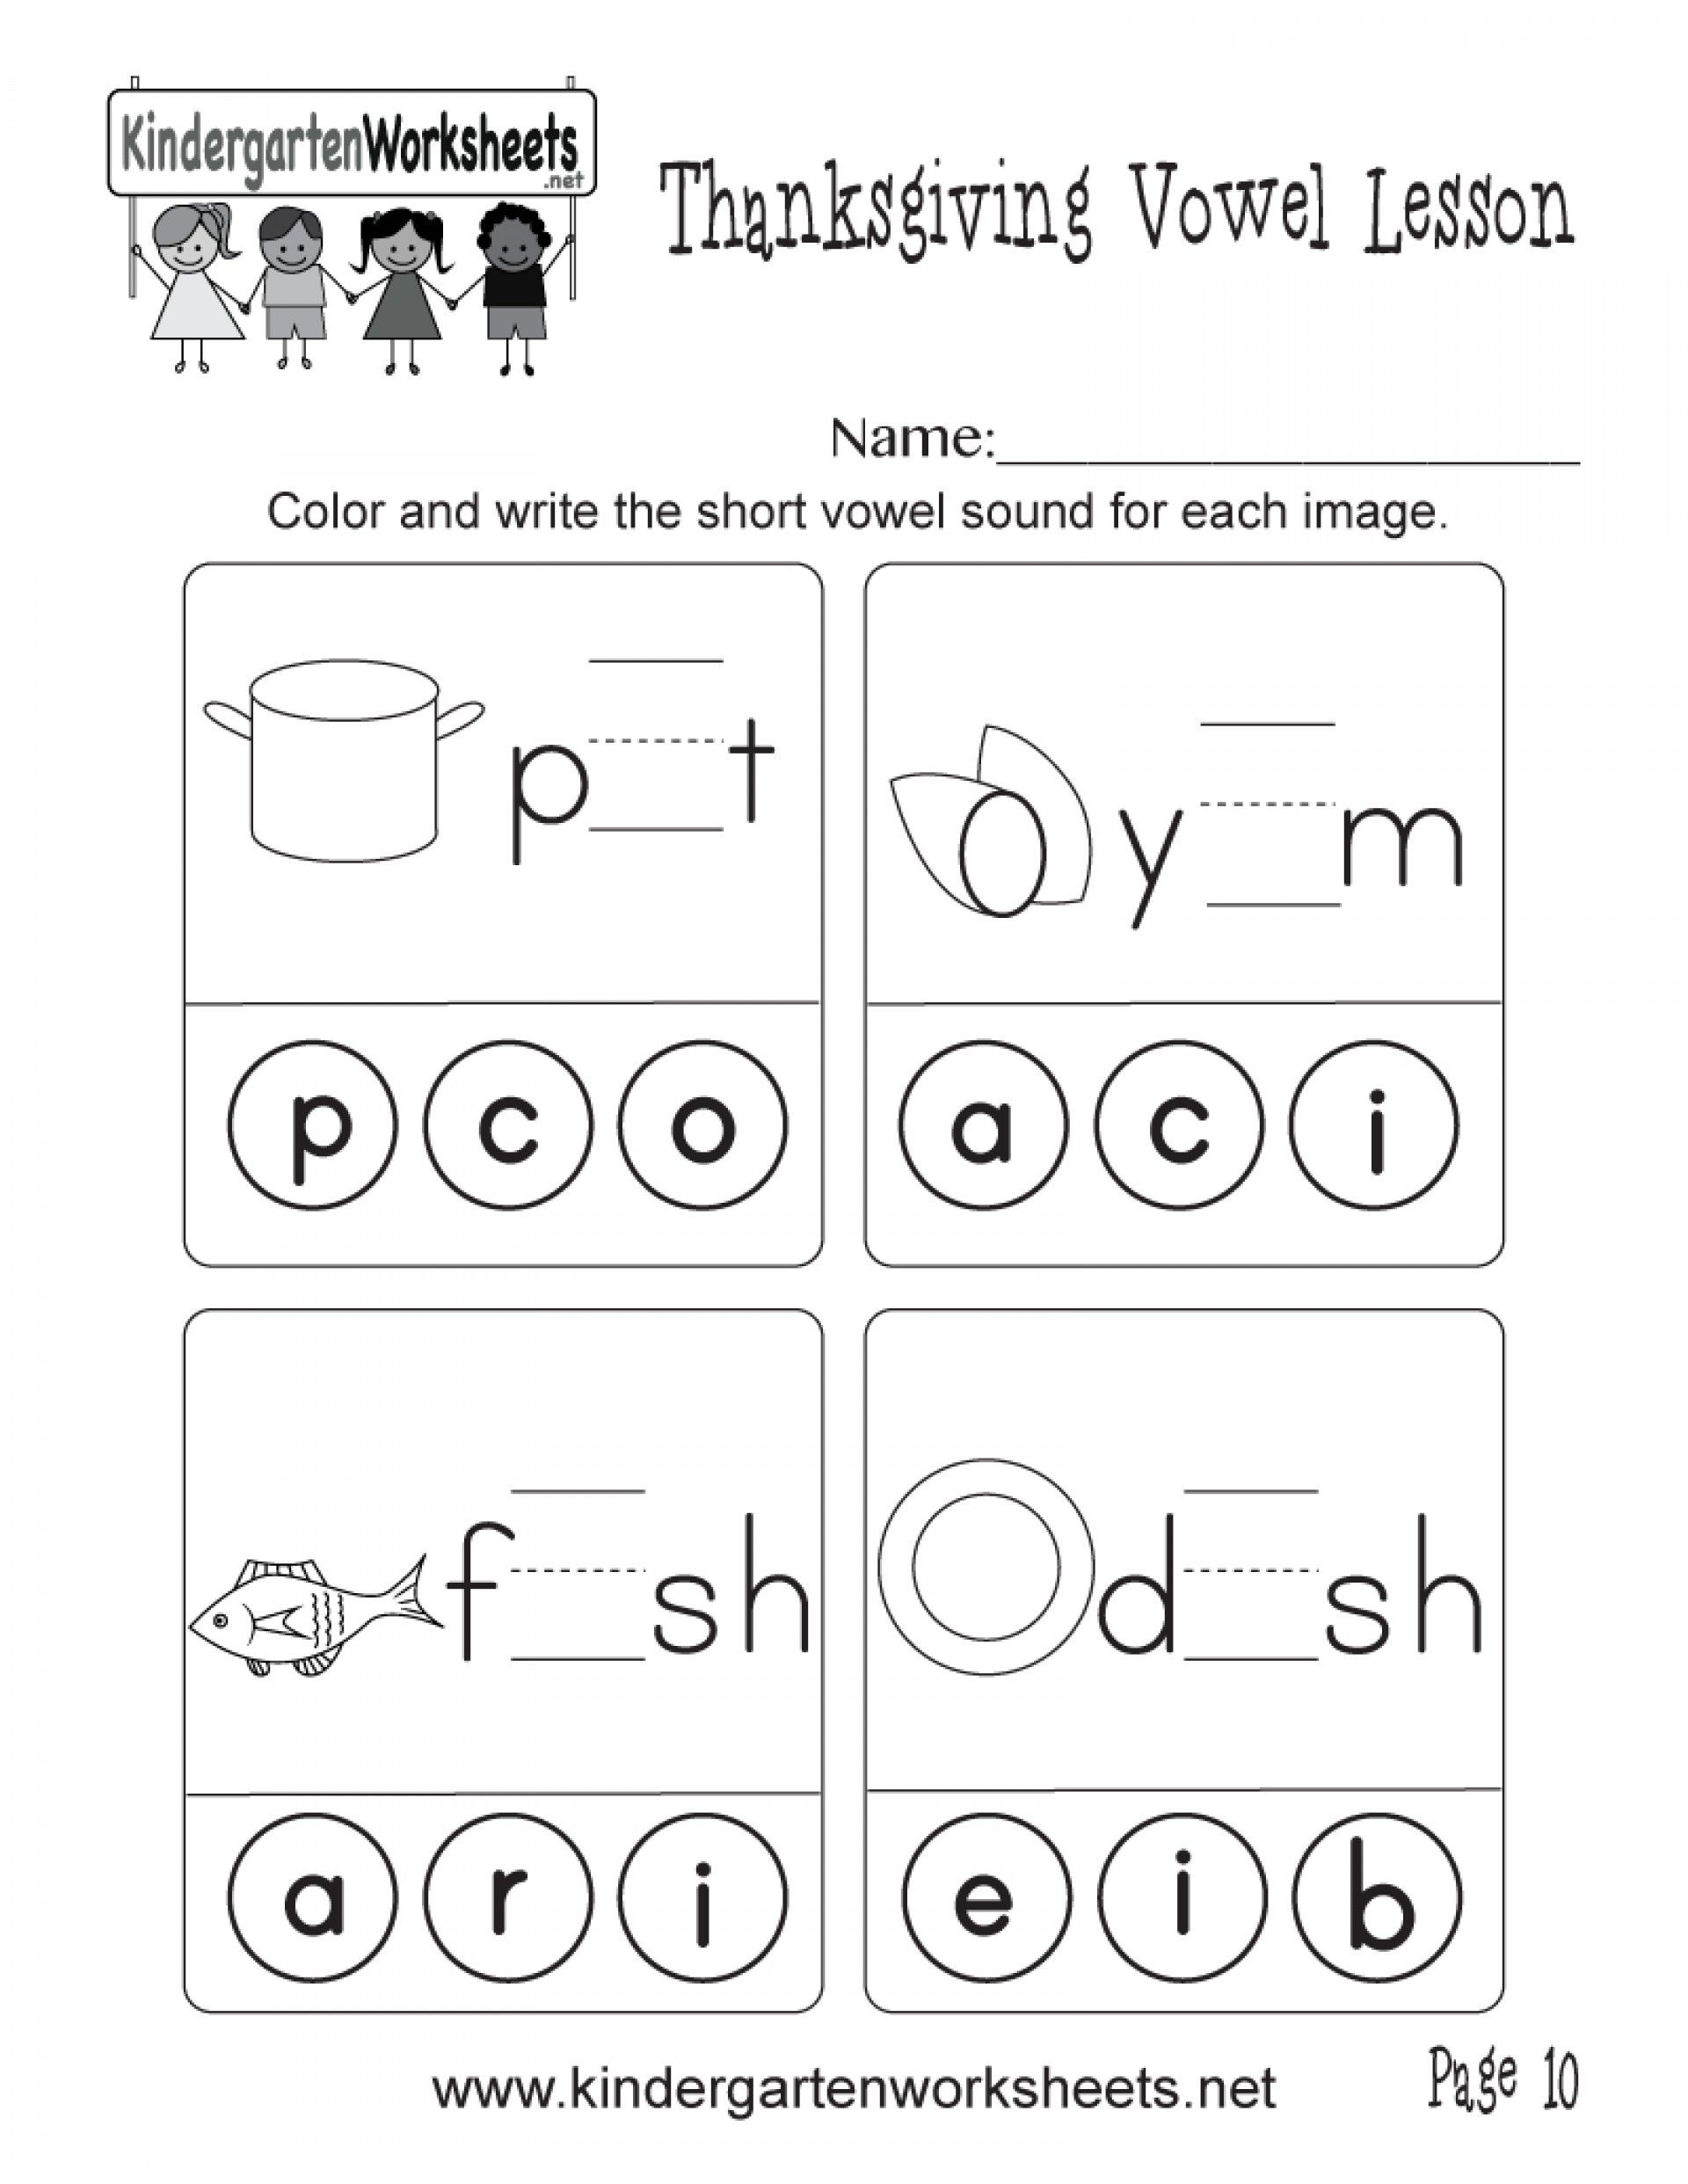 3 Worksheet Free Preschool Kindergarten Worksheets Vowels Long Vowels Free Workshee Vowel Worksheets Short Vowel Worksheets Kindergarten Worksheets Printable [ 2484 x 1920 Pixel ]